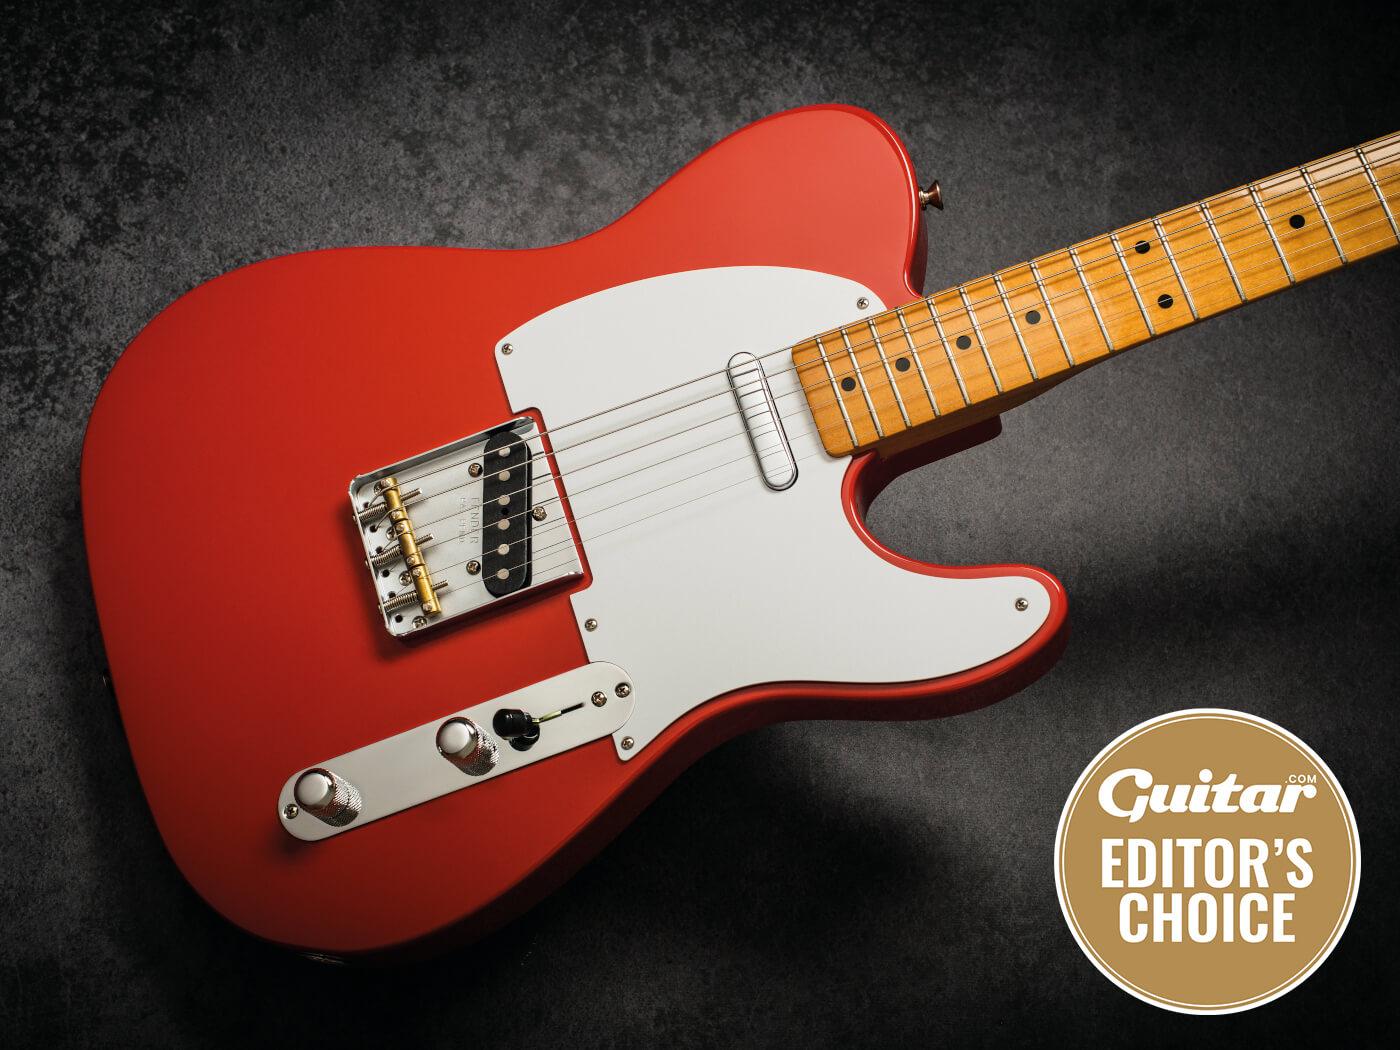 Fender Vintera 50s Telecaster Fiesta Red style shot